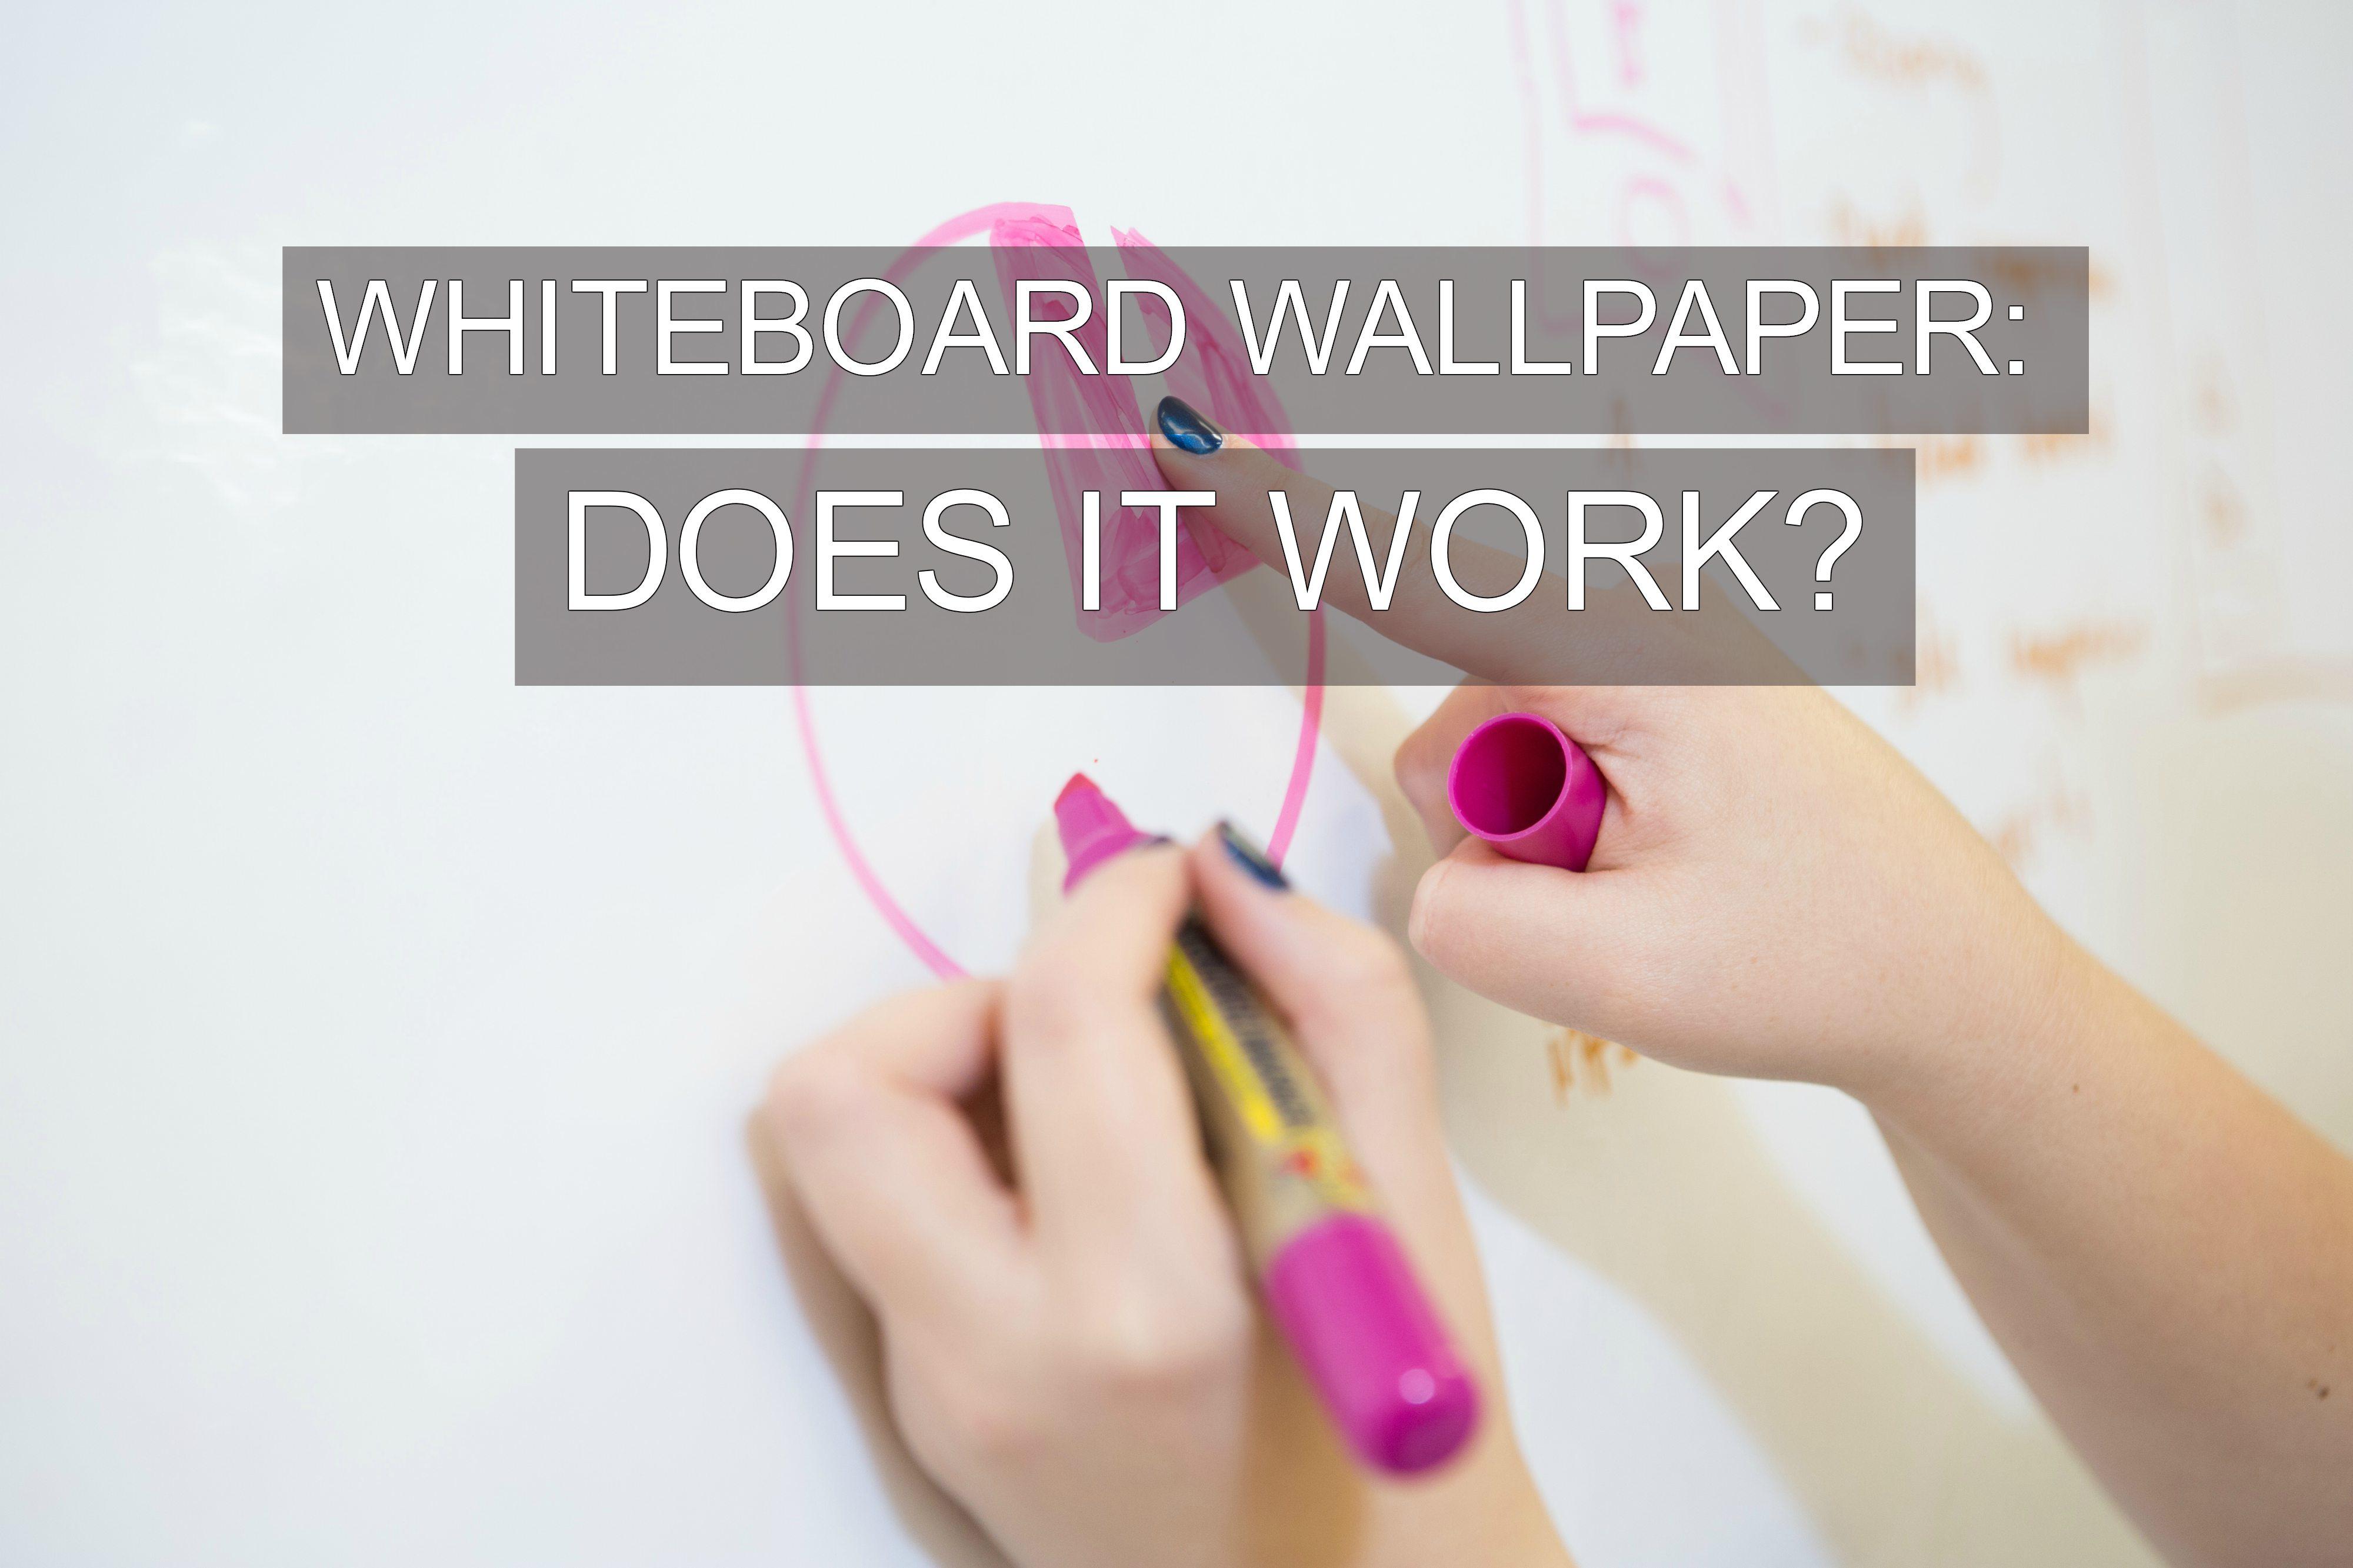 Whiteboard Wallpaper Does It Work   Antarc Kenya Smarter Surfaces 4000x2666